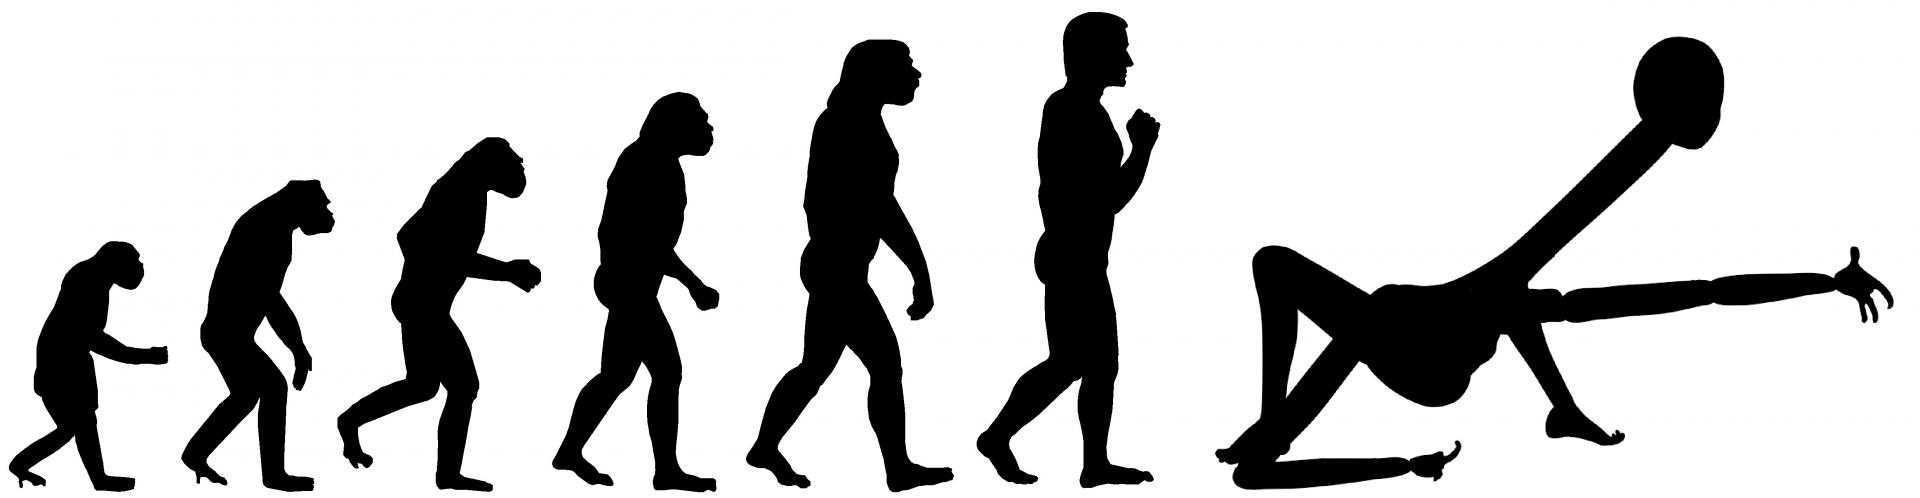 01-evolutionary-chain meme.png